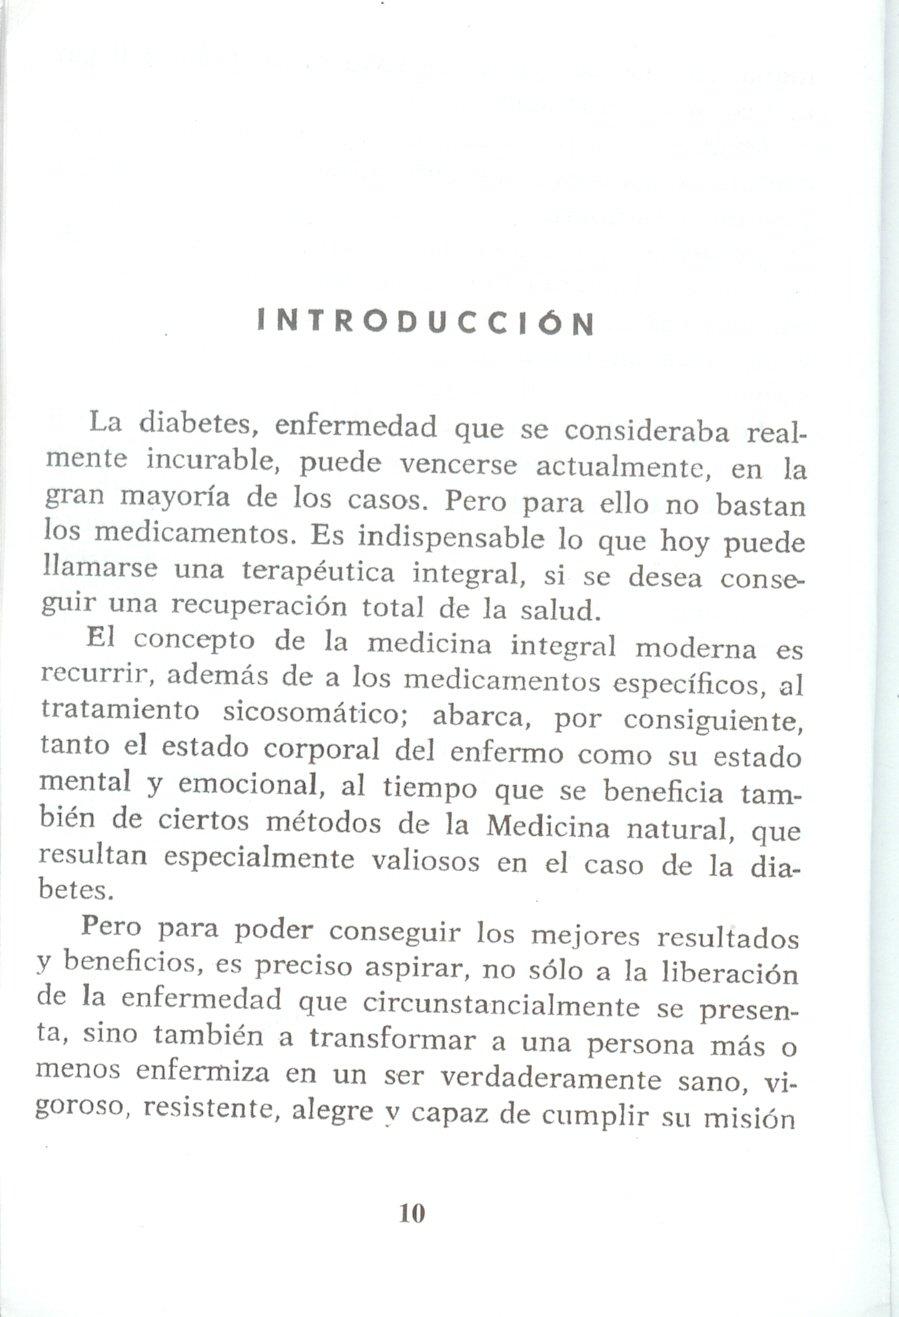 Diabetes (Spanish Edition): Vander, Berbera Editores: 9789707830868: Amazon.com: Books